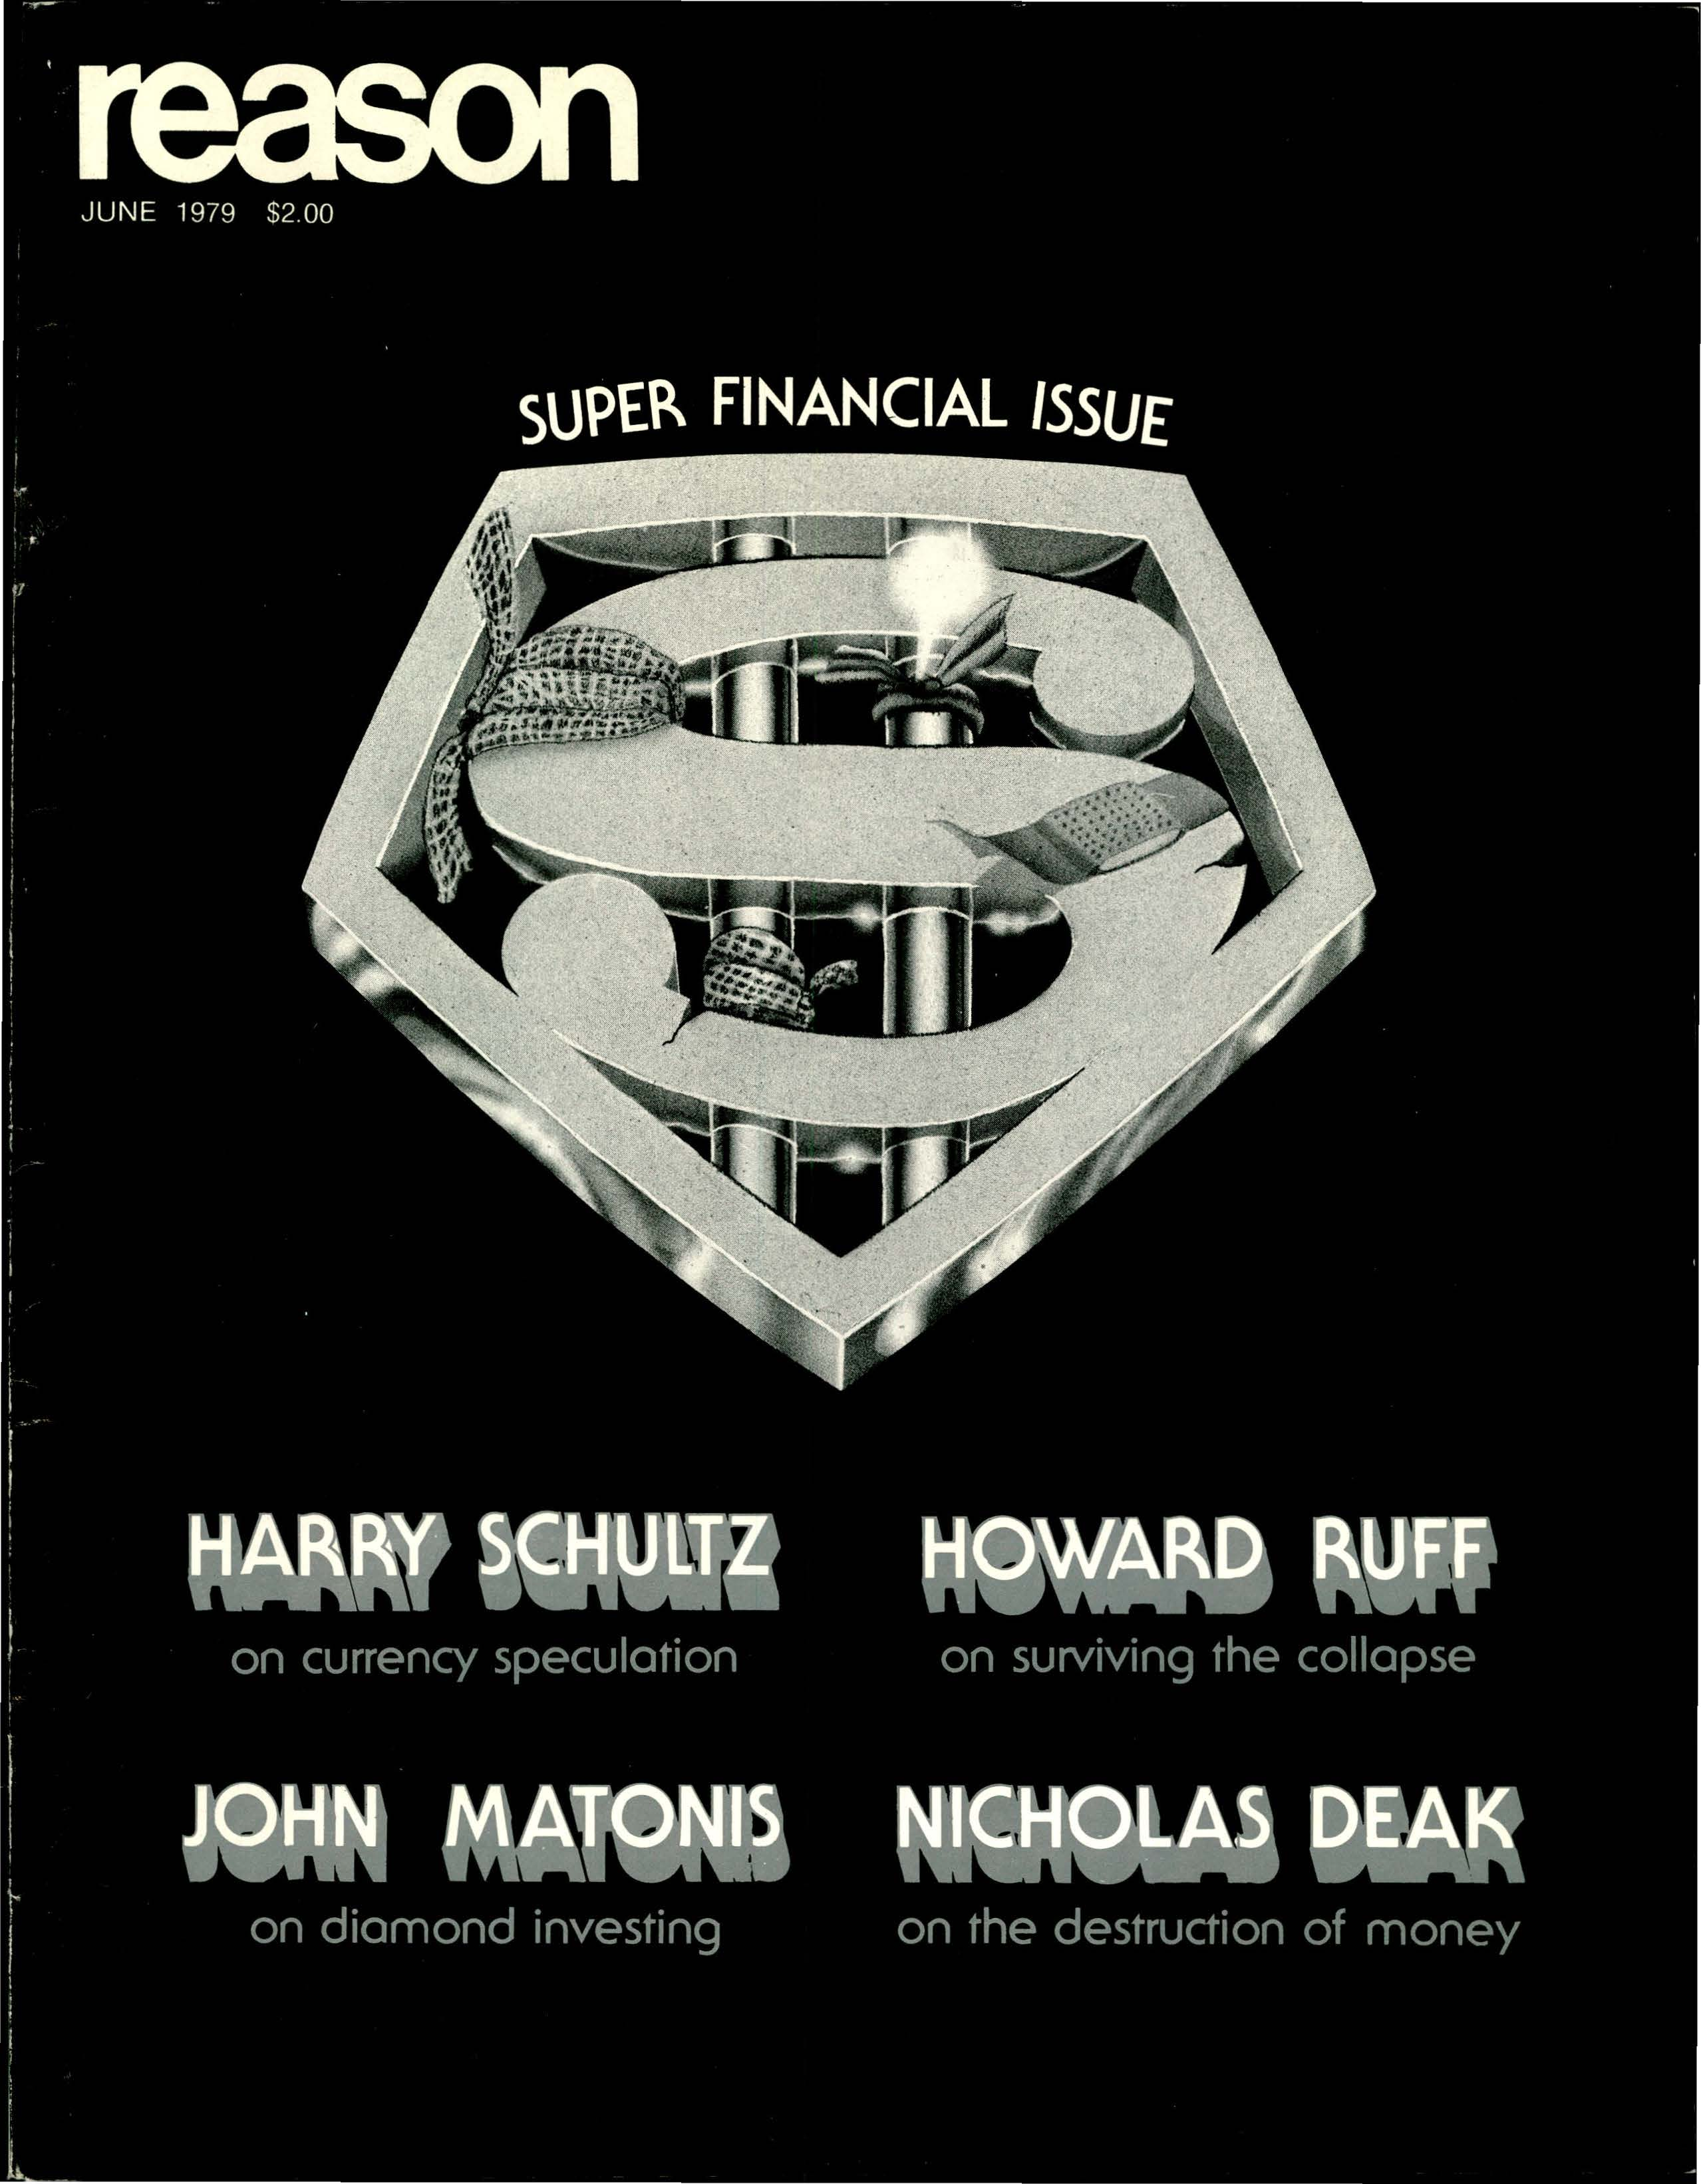 Reason Magazine, June 1979 cover image